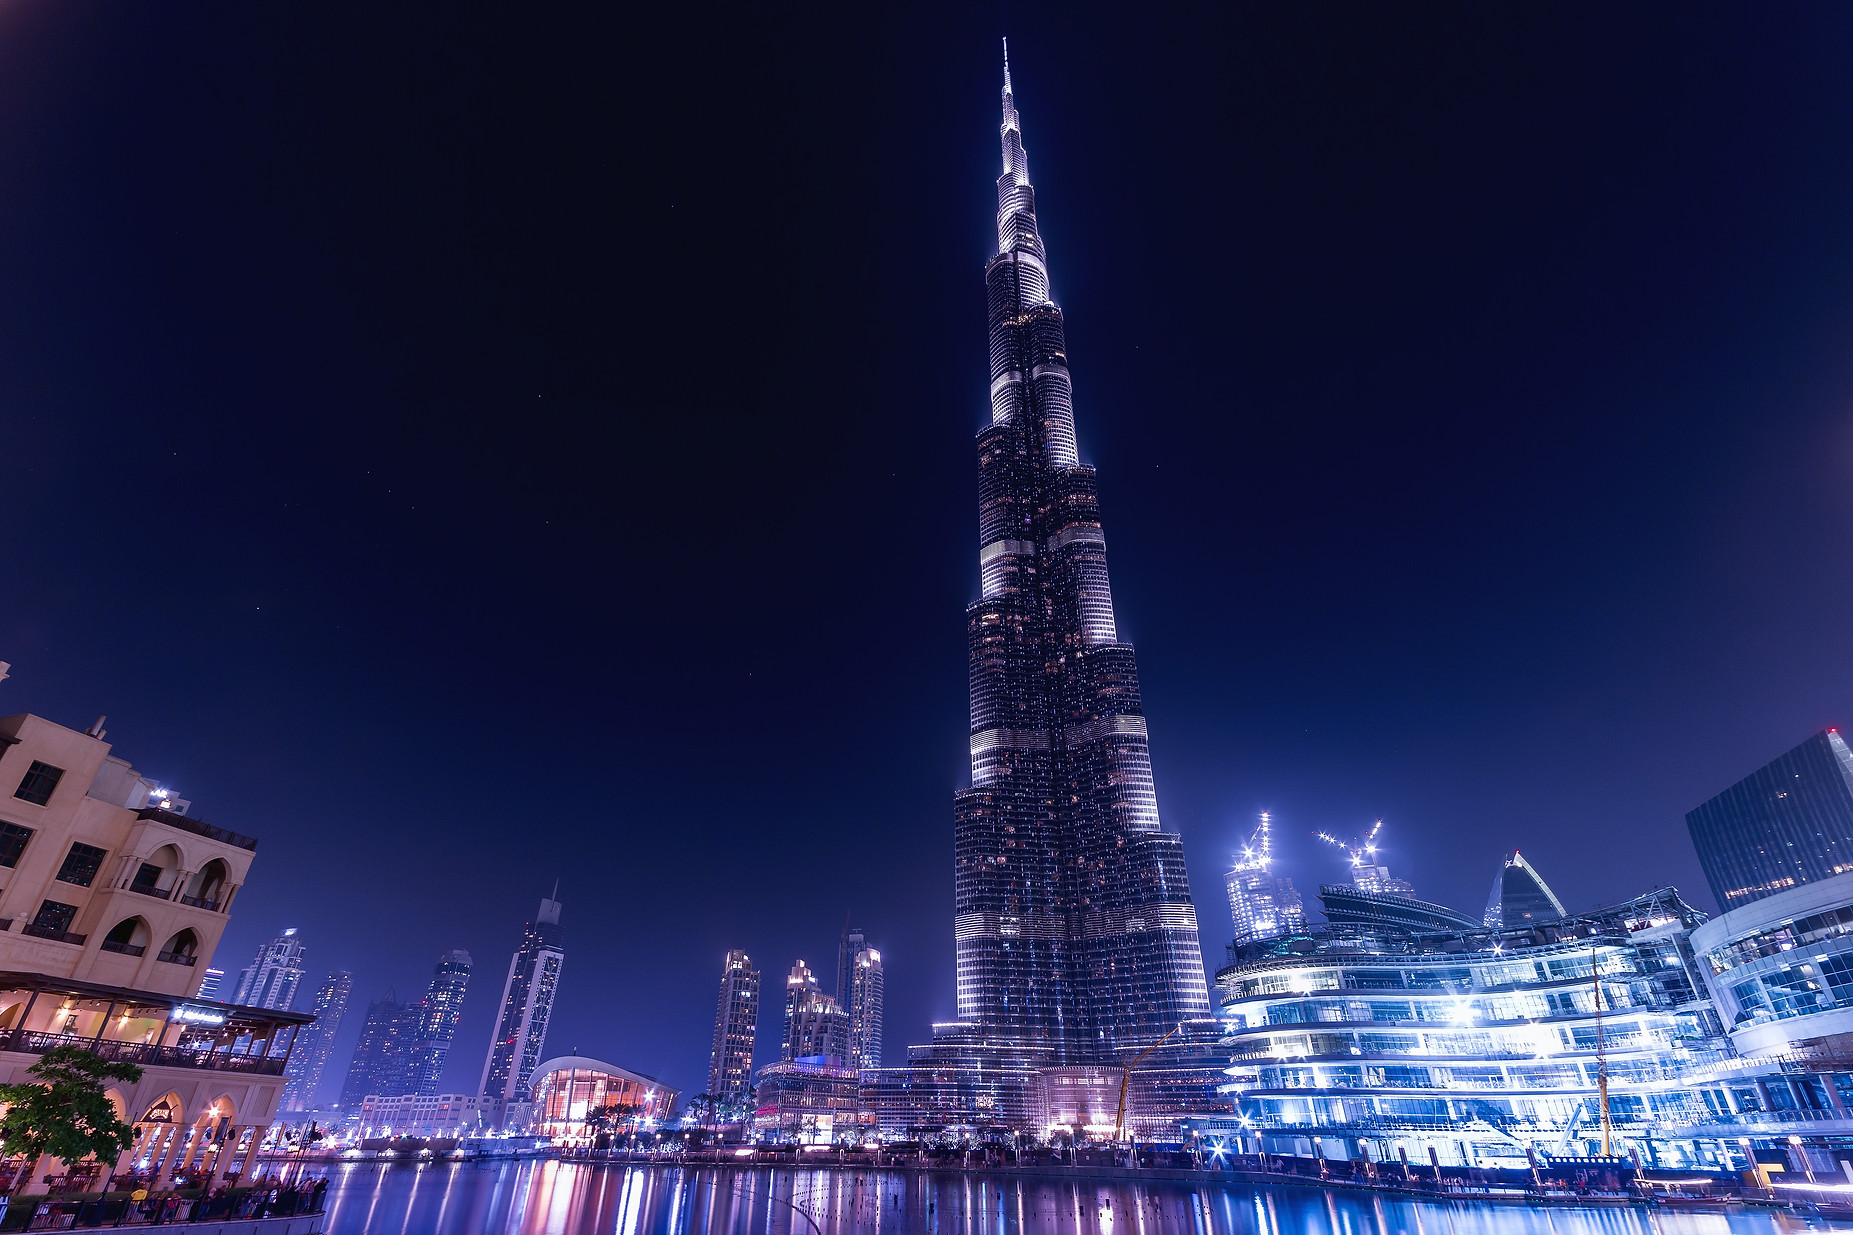 burj-khalifa-4200x2800-burj-dubai-skyscr